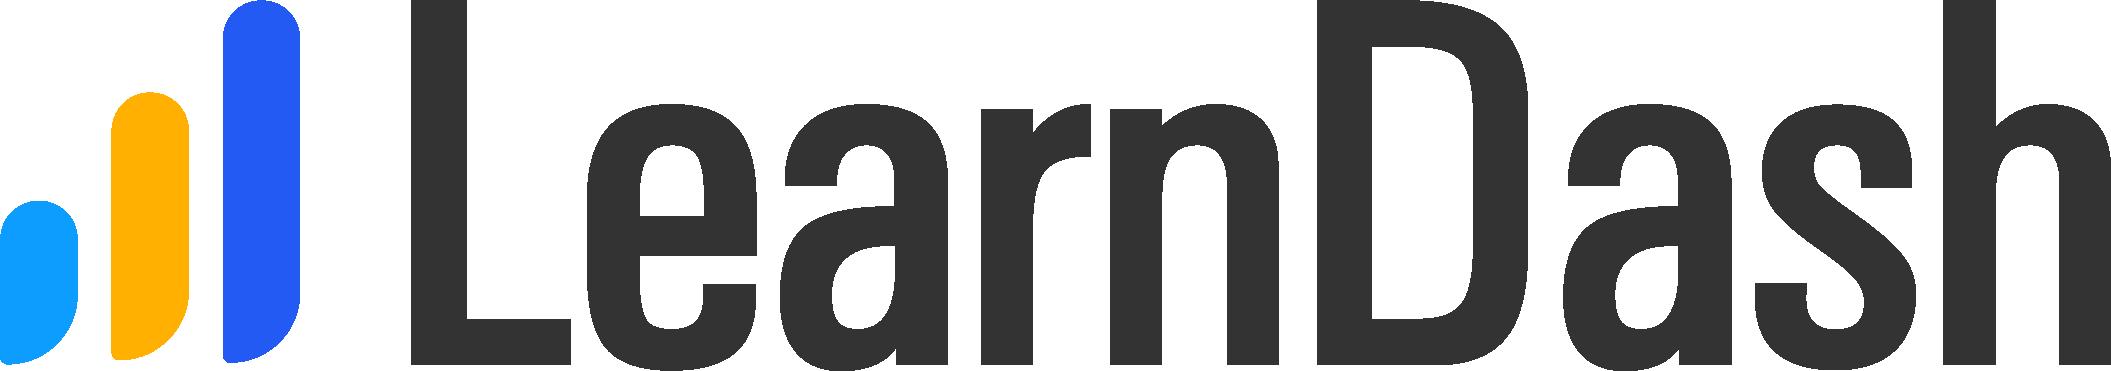 learndash logo WPism